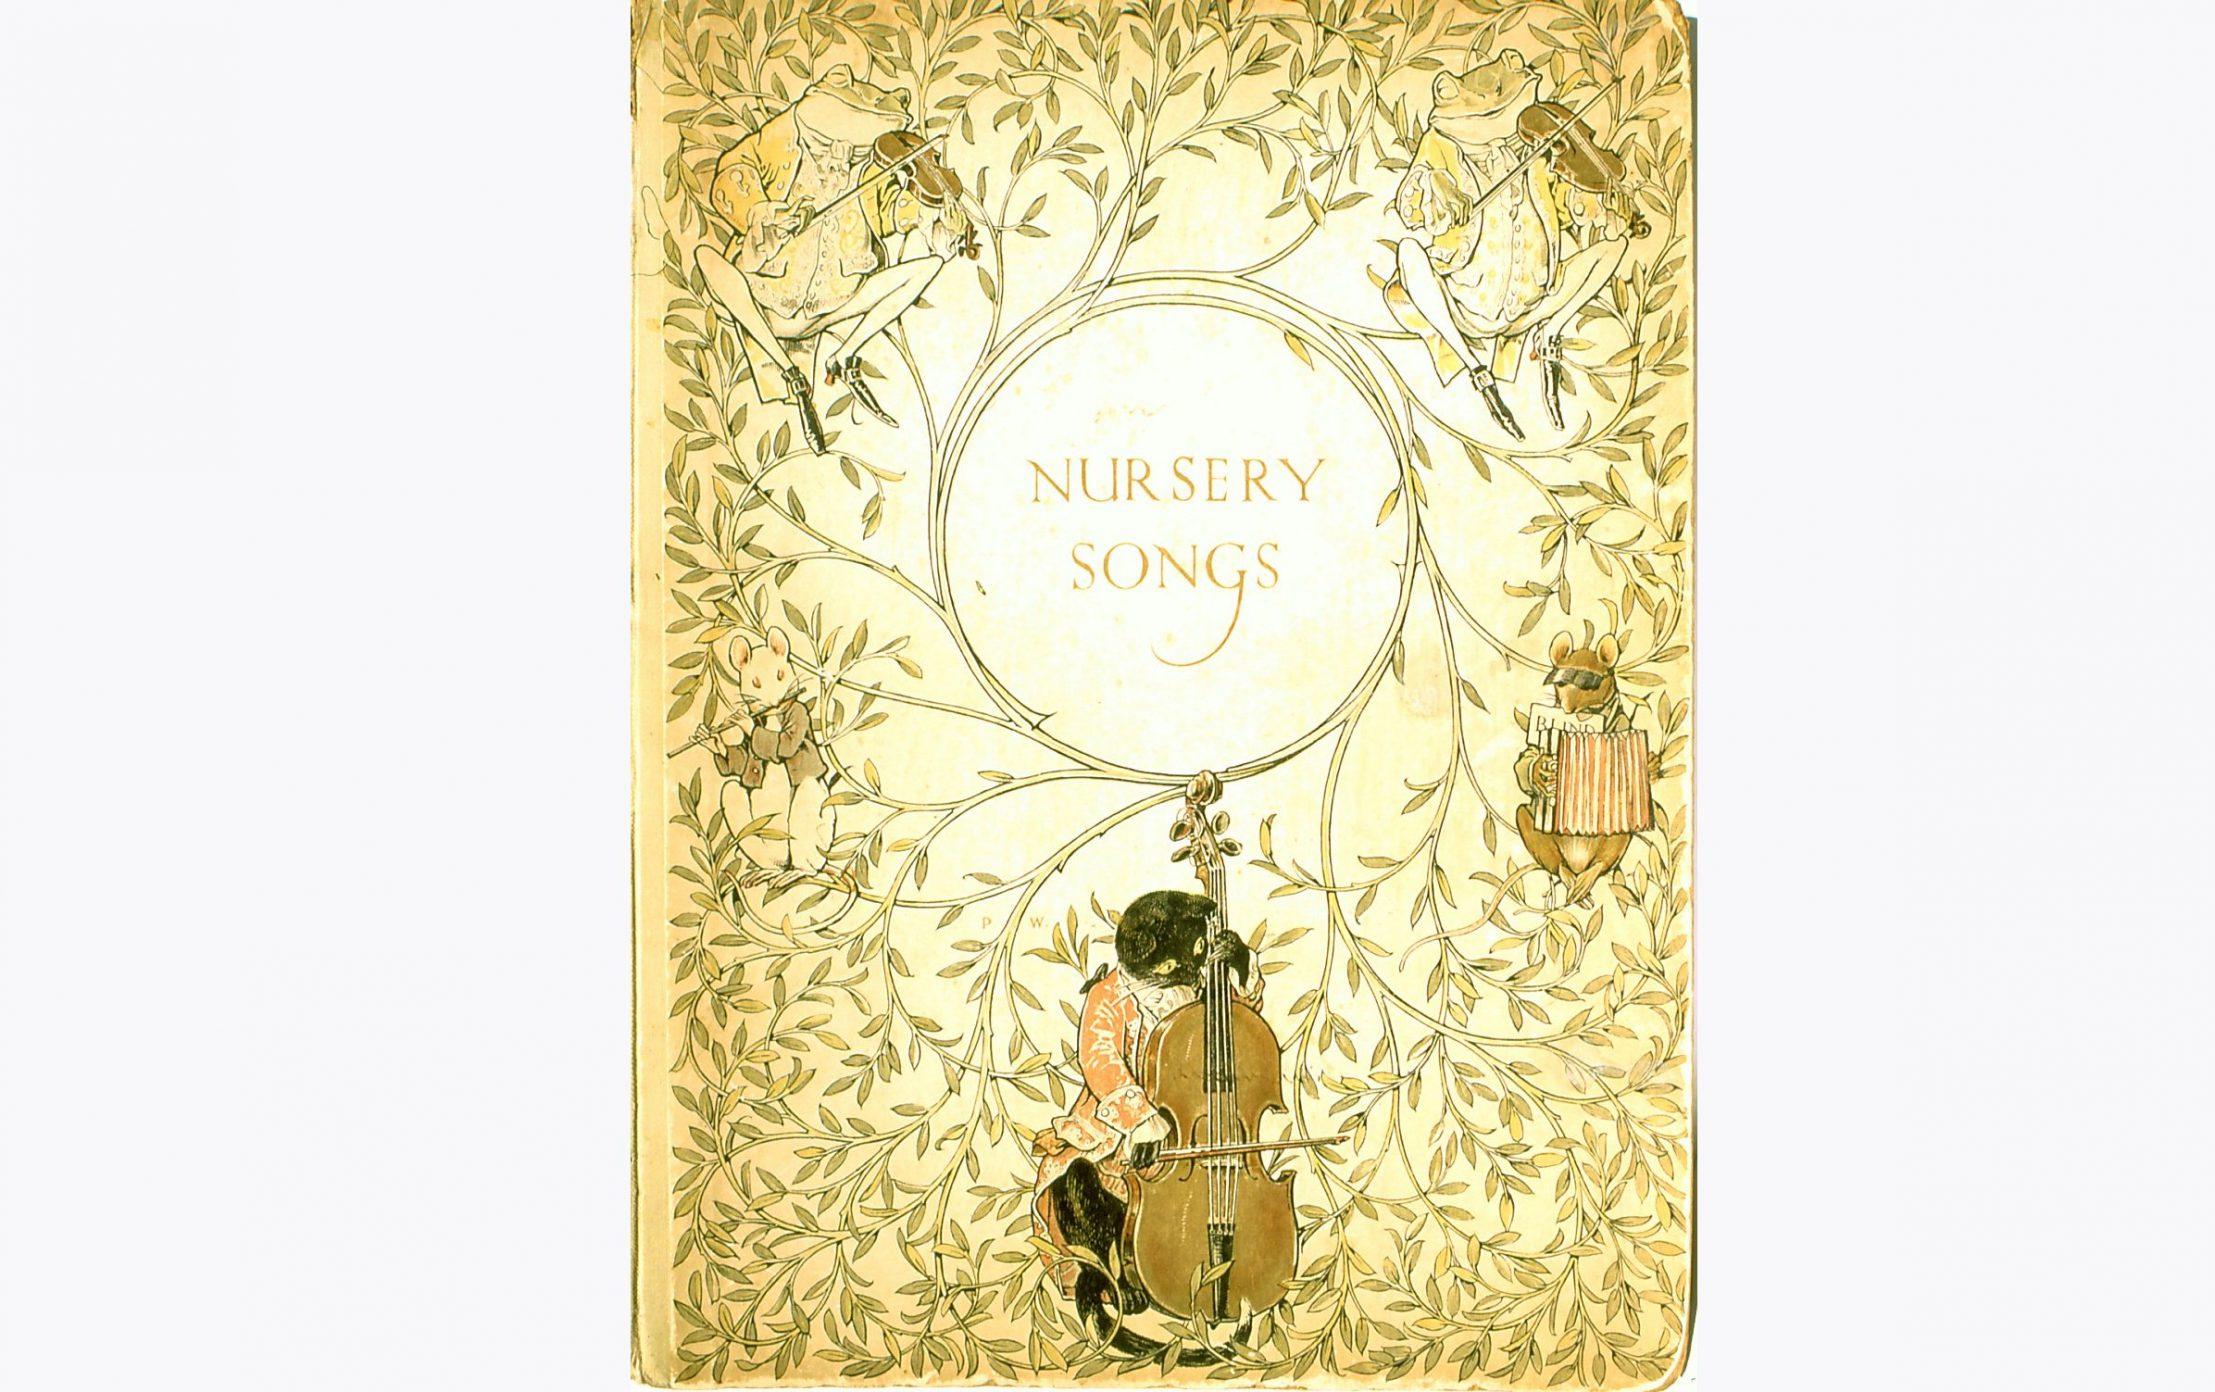 Woodroffe Nursery Songs canvas 1